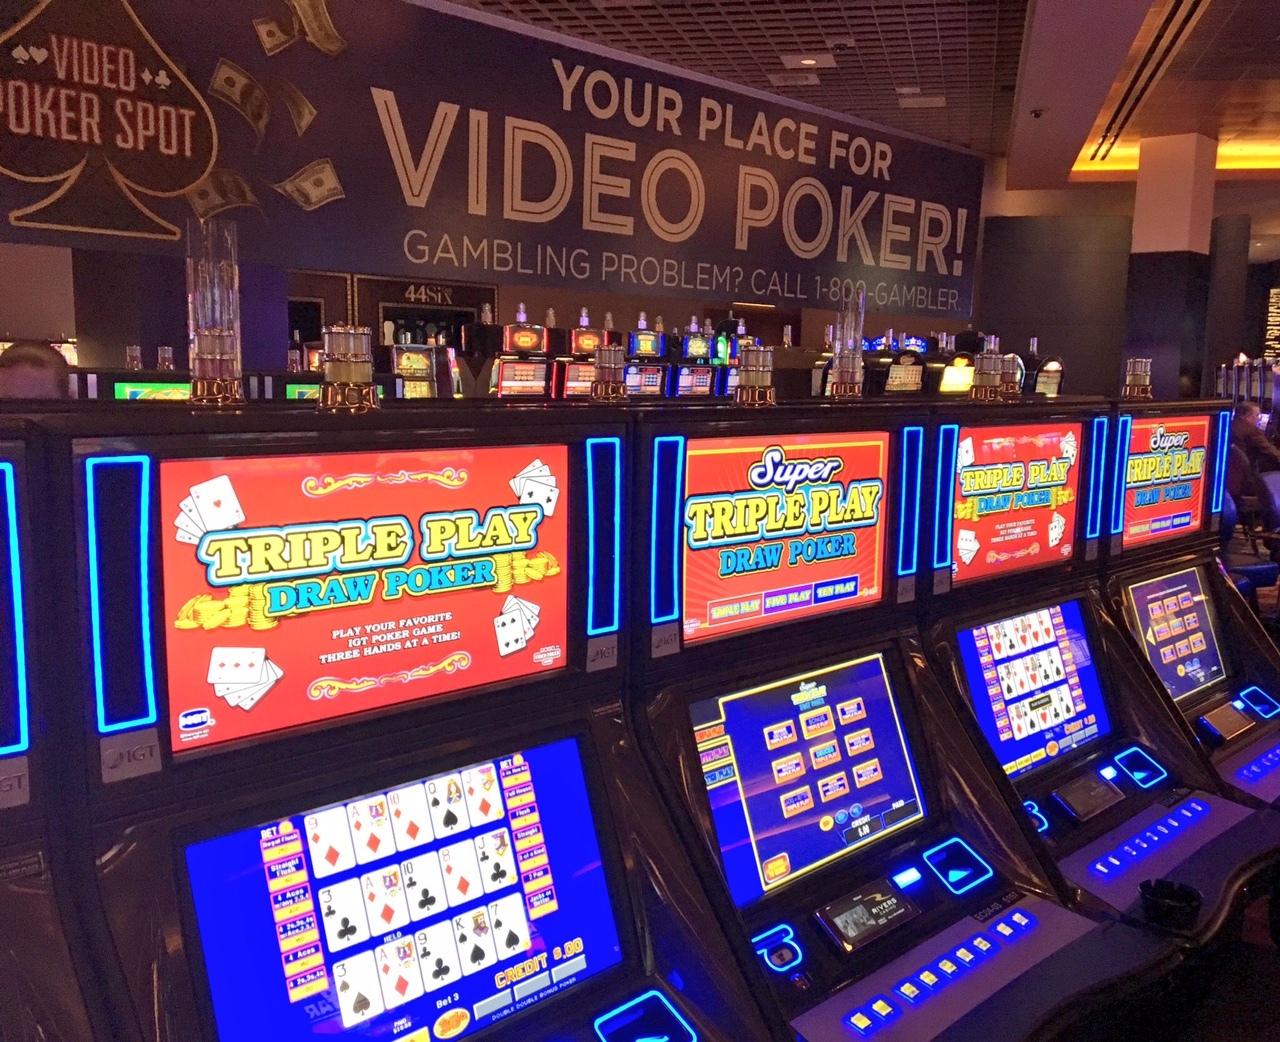 Poker at rivers casino pittsburgh